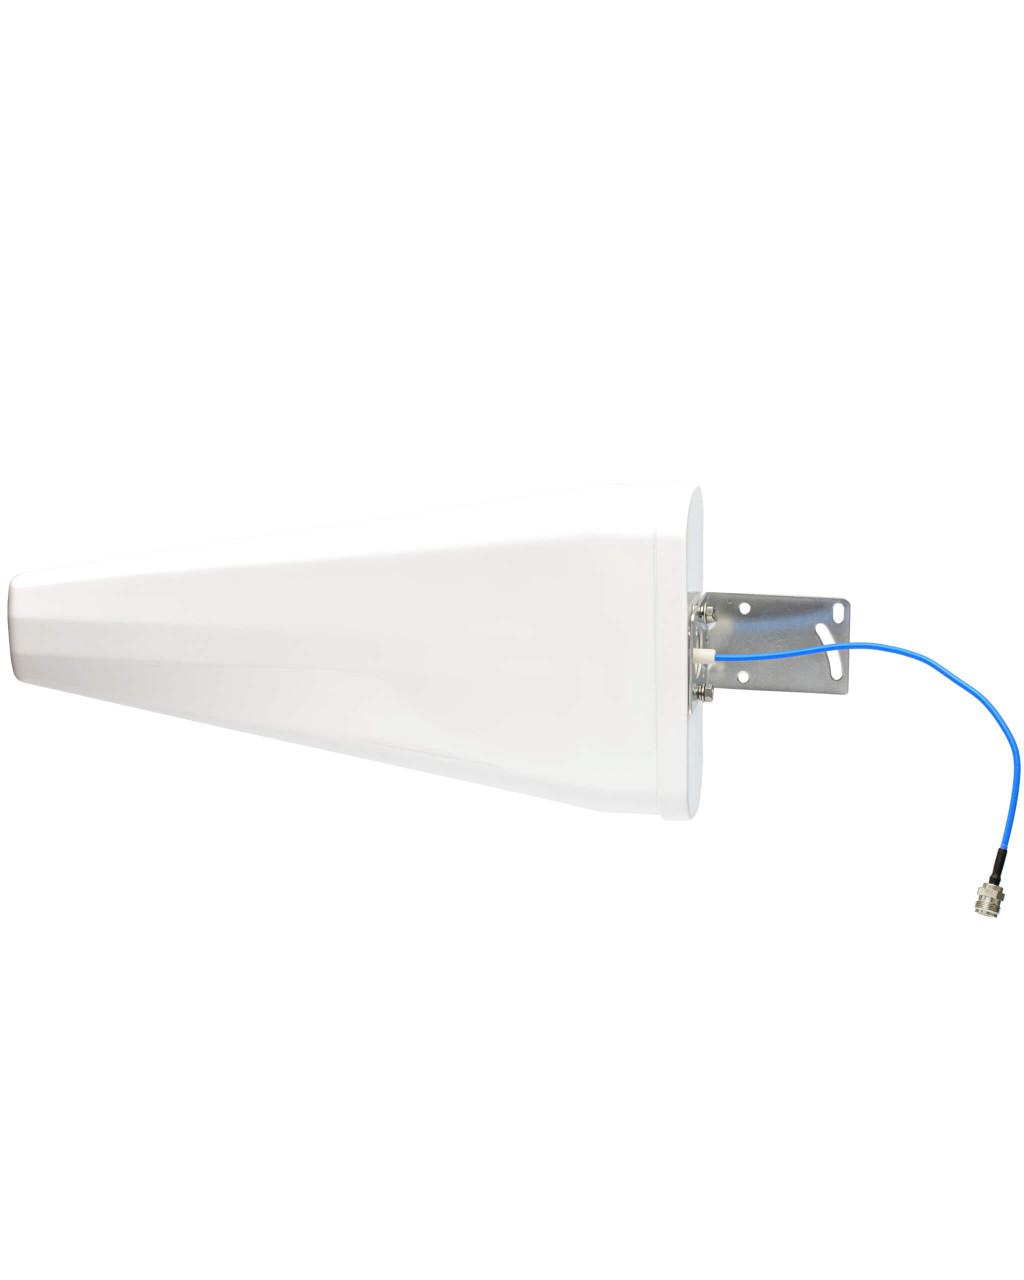 The Quicksilver 5G Yagi Directional Antenna side angle